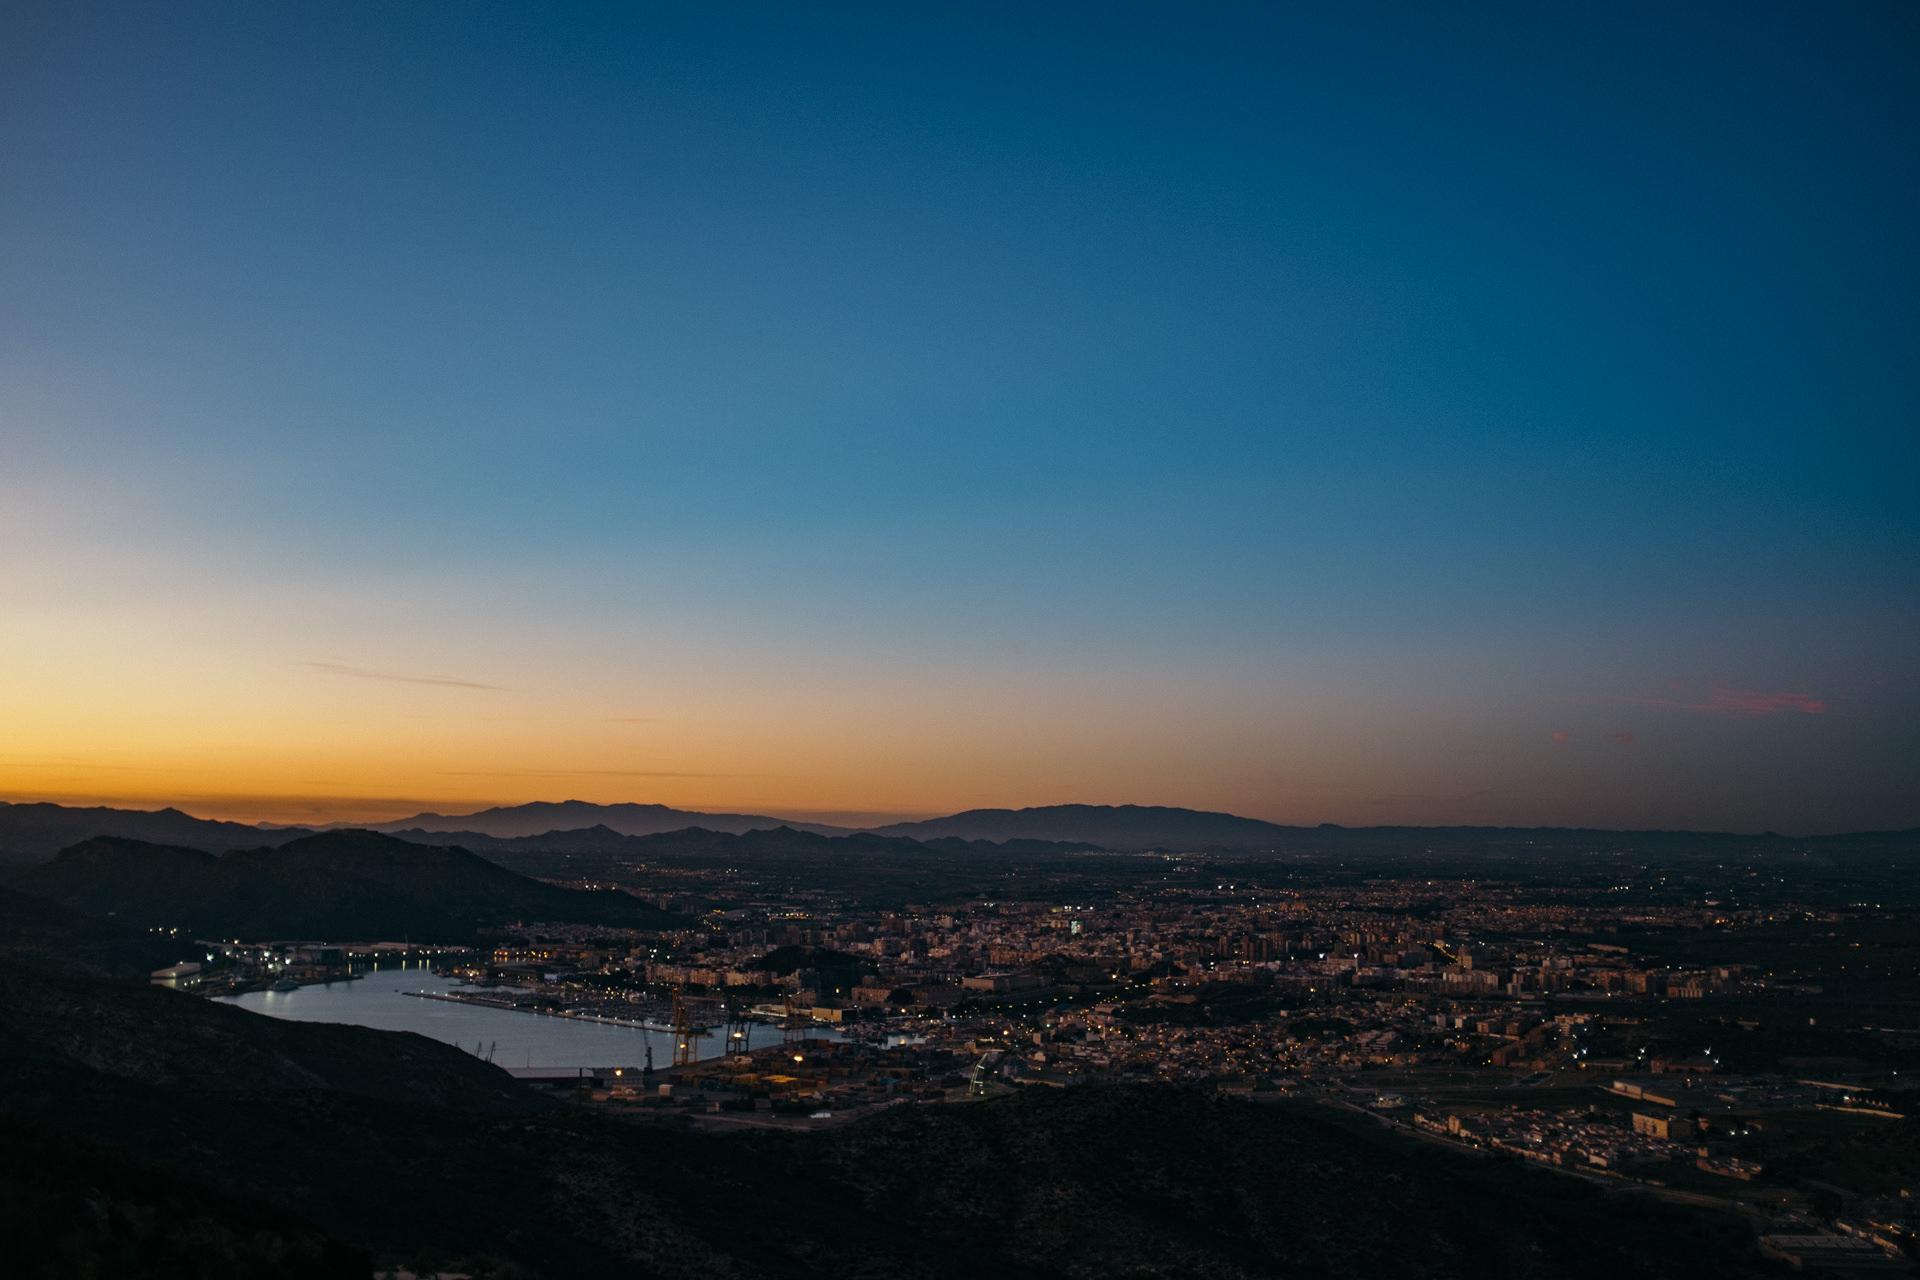 sunset over cartagena, spain